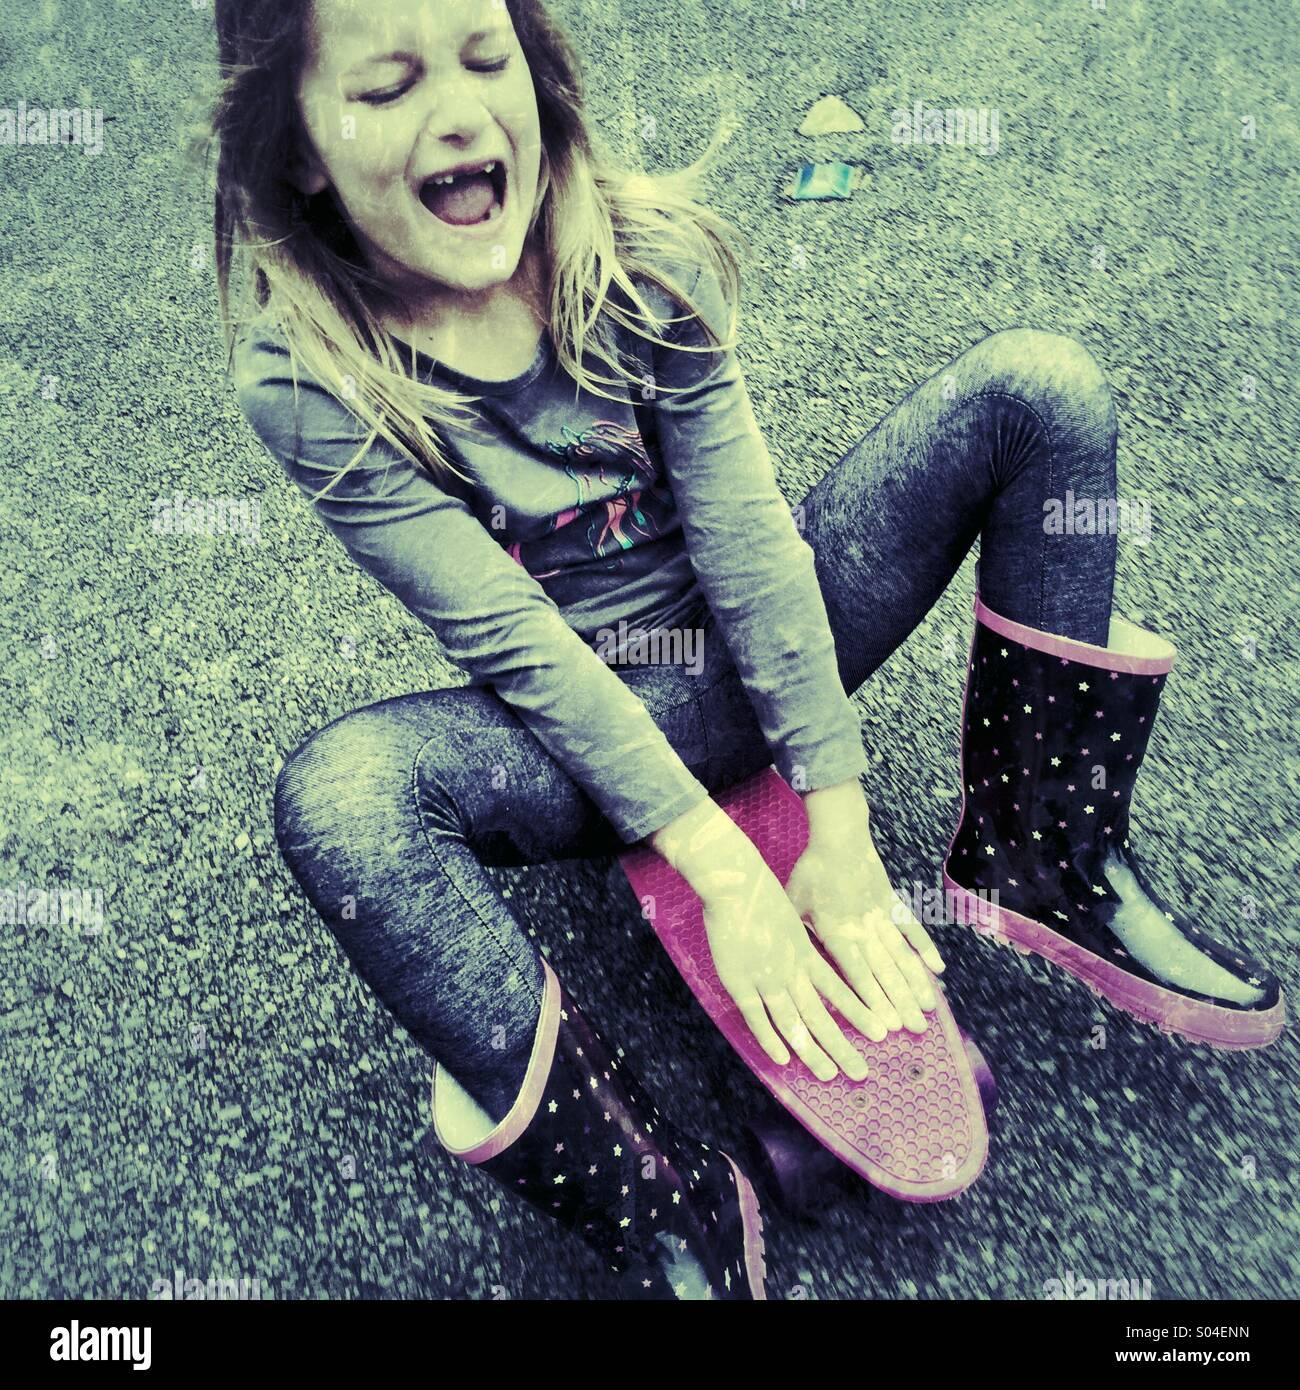 Girl with skateboard - Stock Image